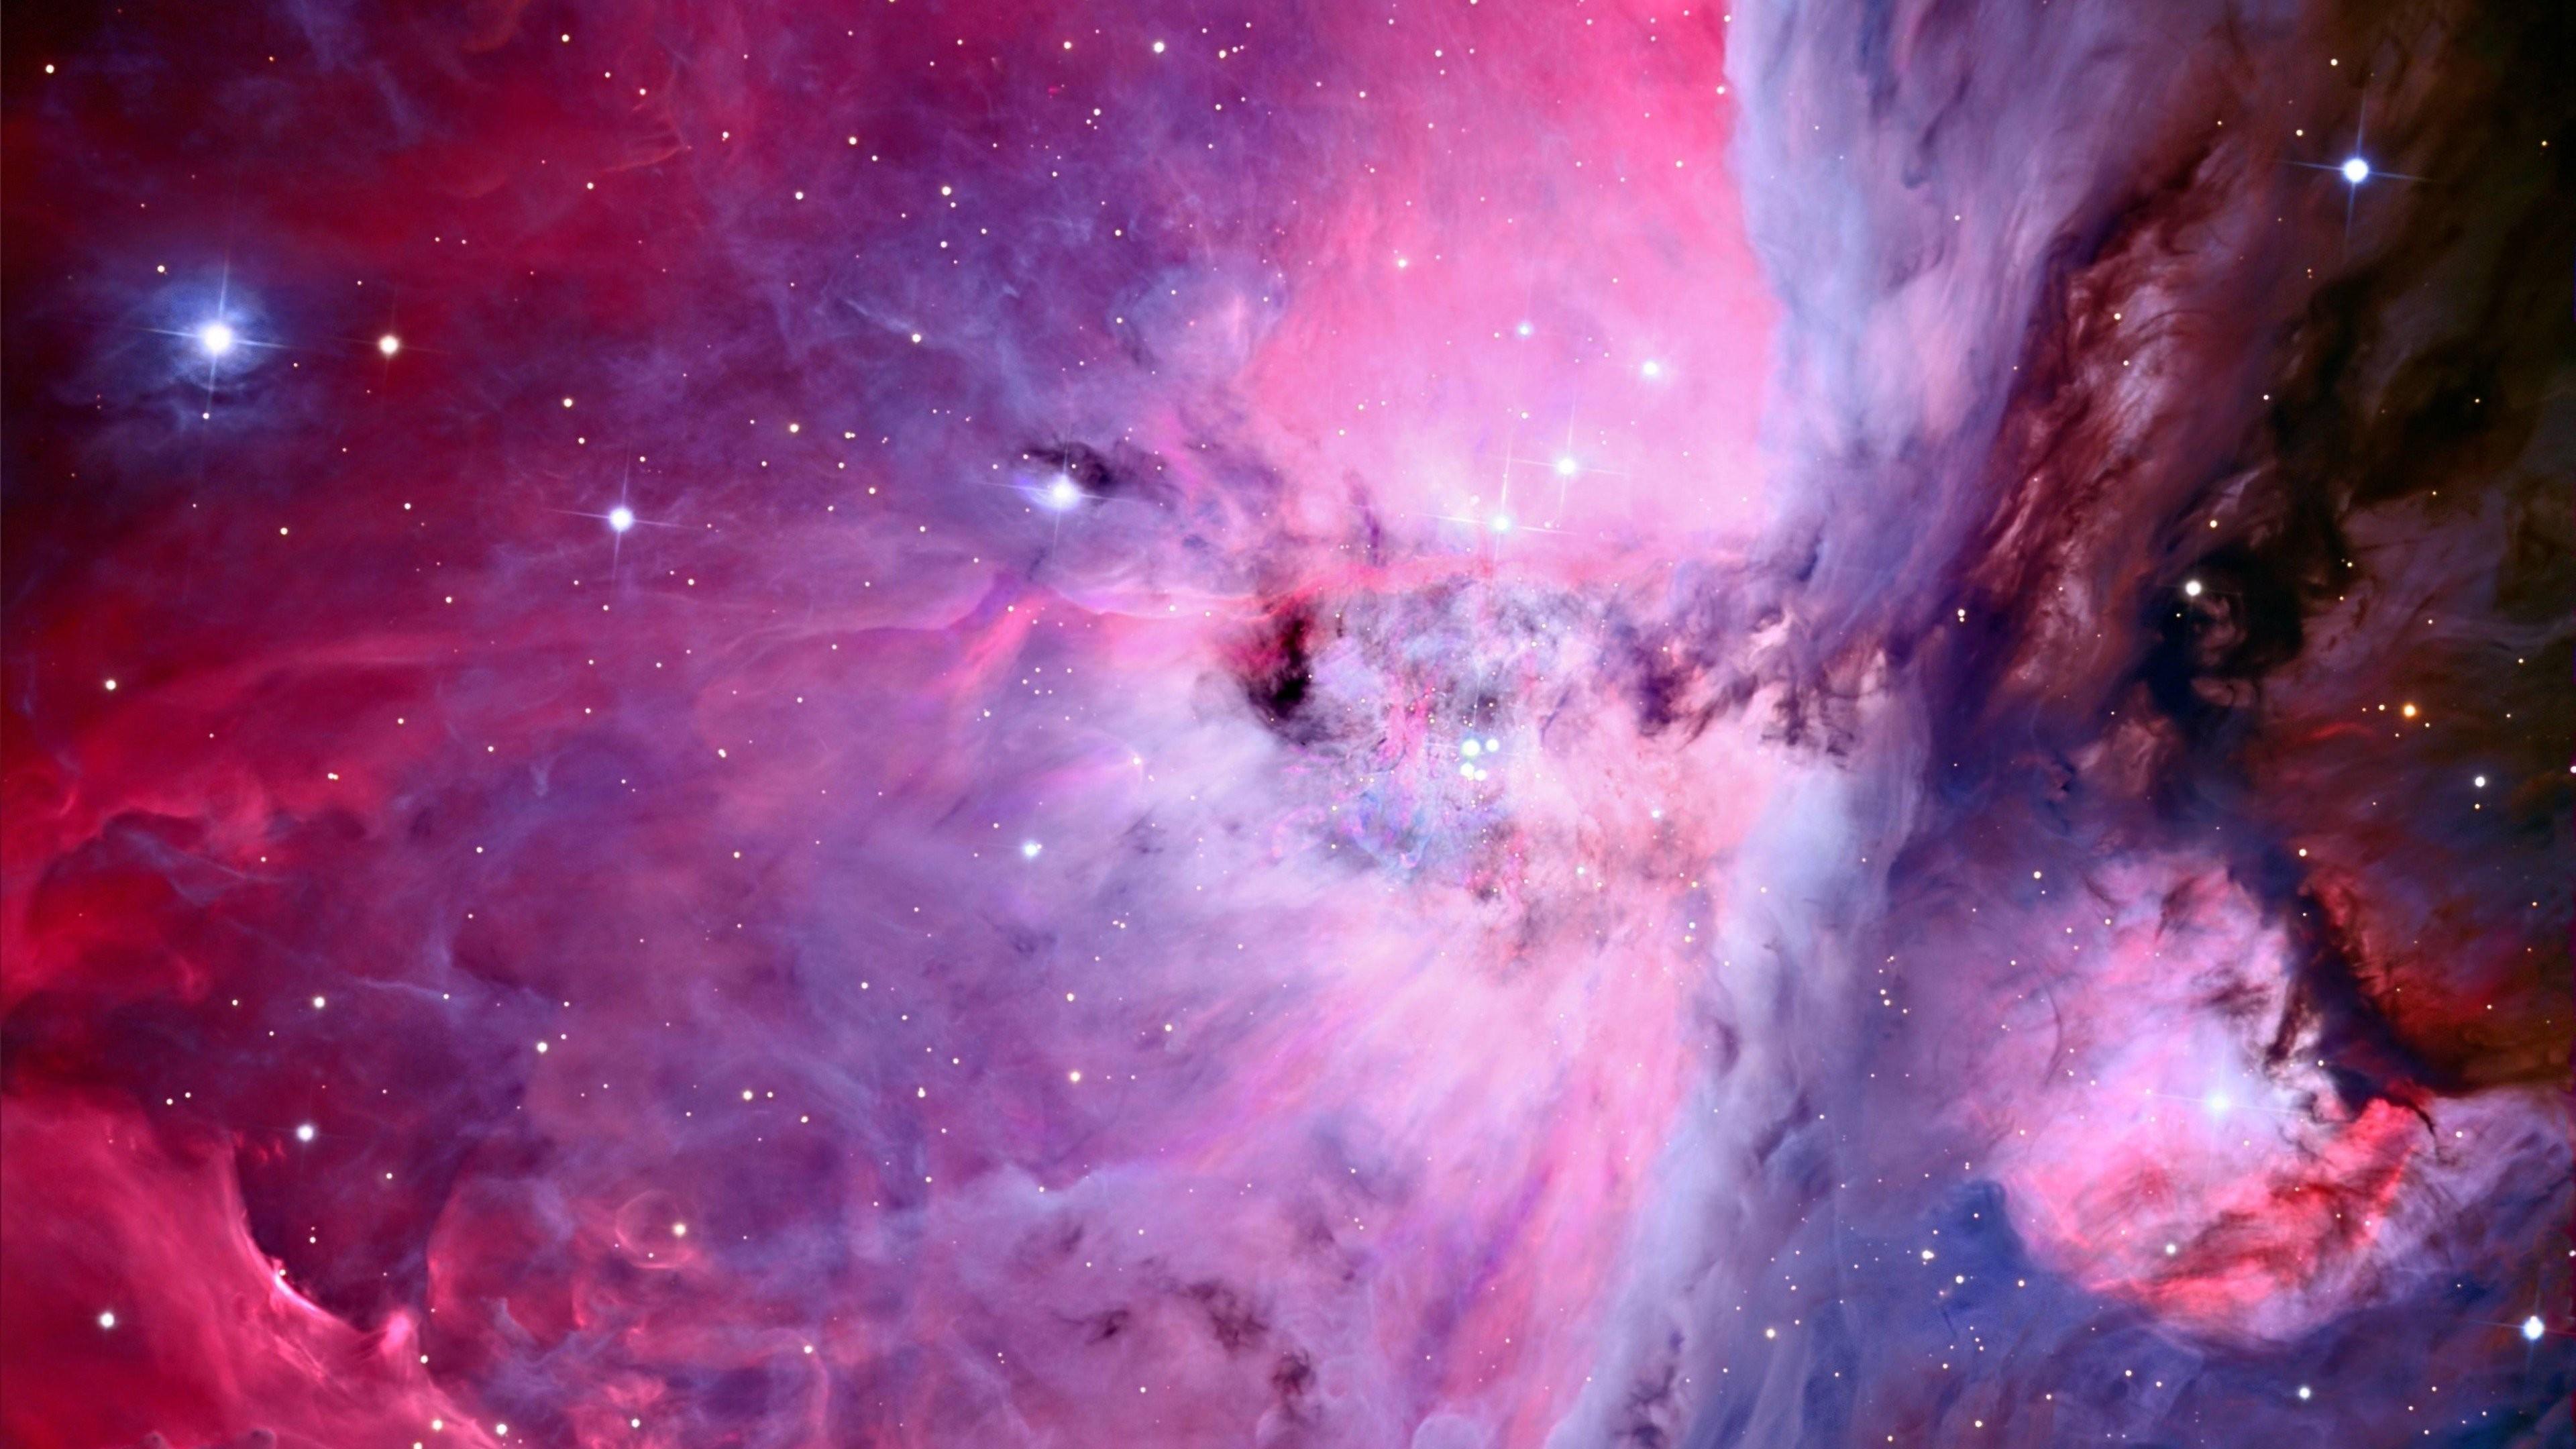 General 3840x2160 space stars nebula space art space clouds